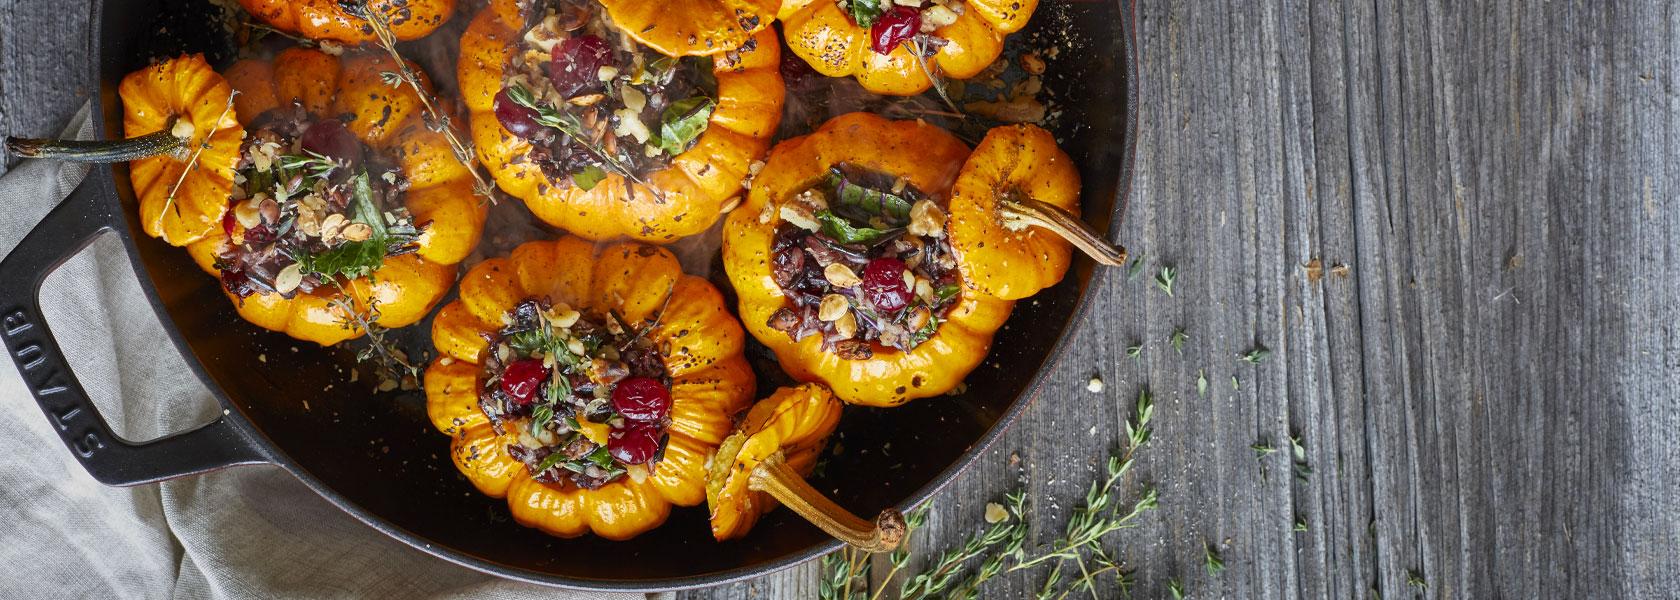 Staub All-Day Pan with stuffed mini pumpkins